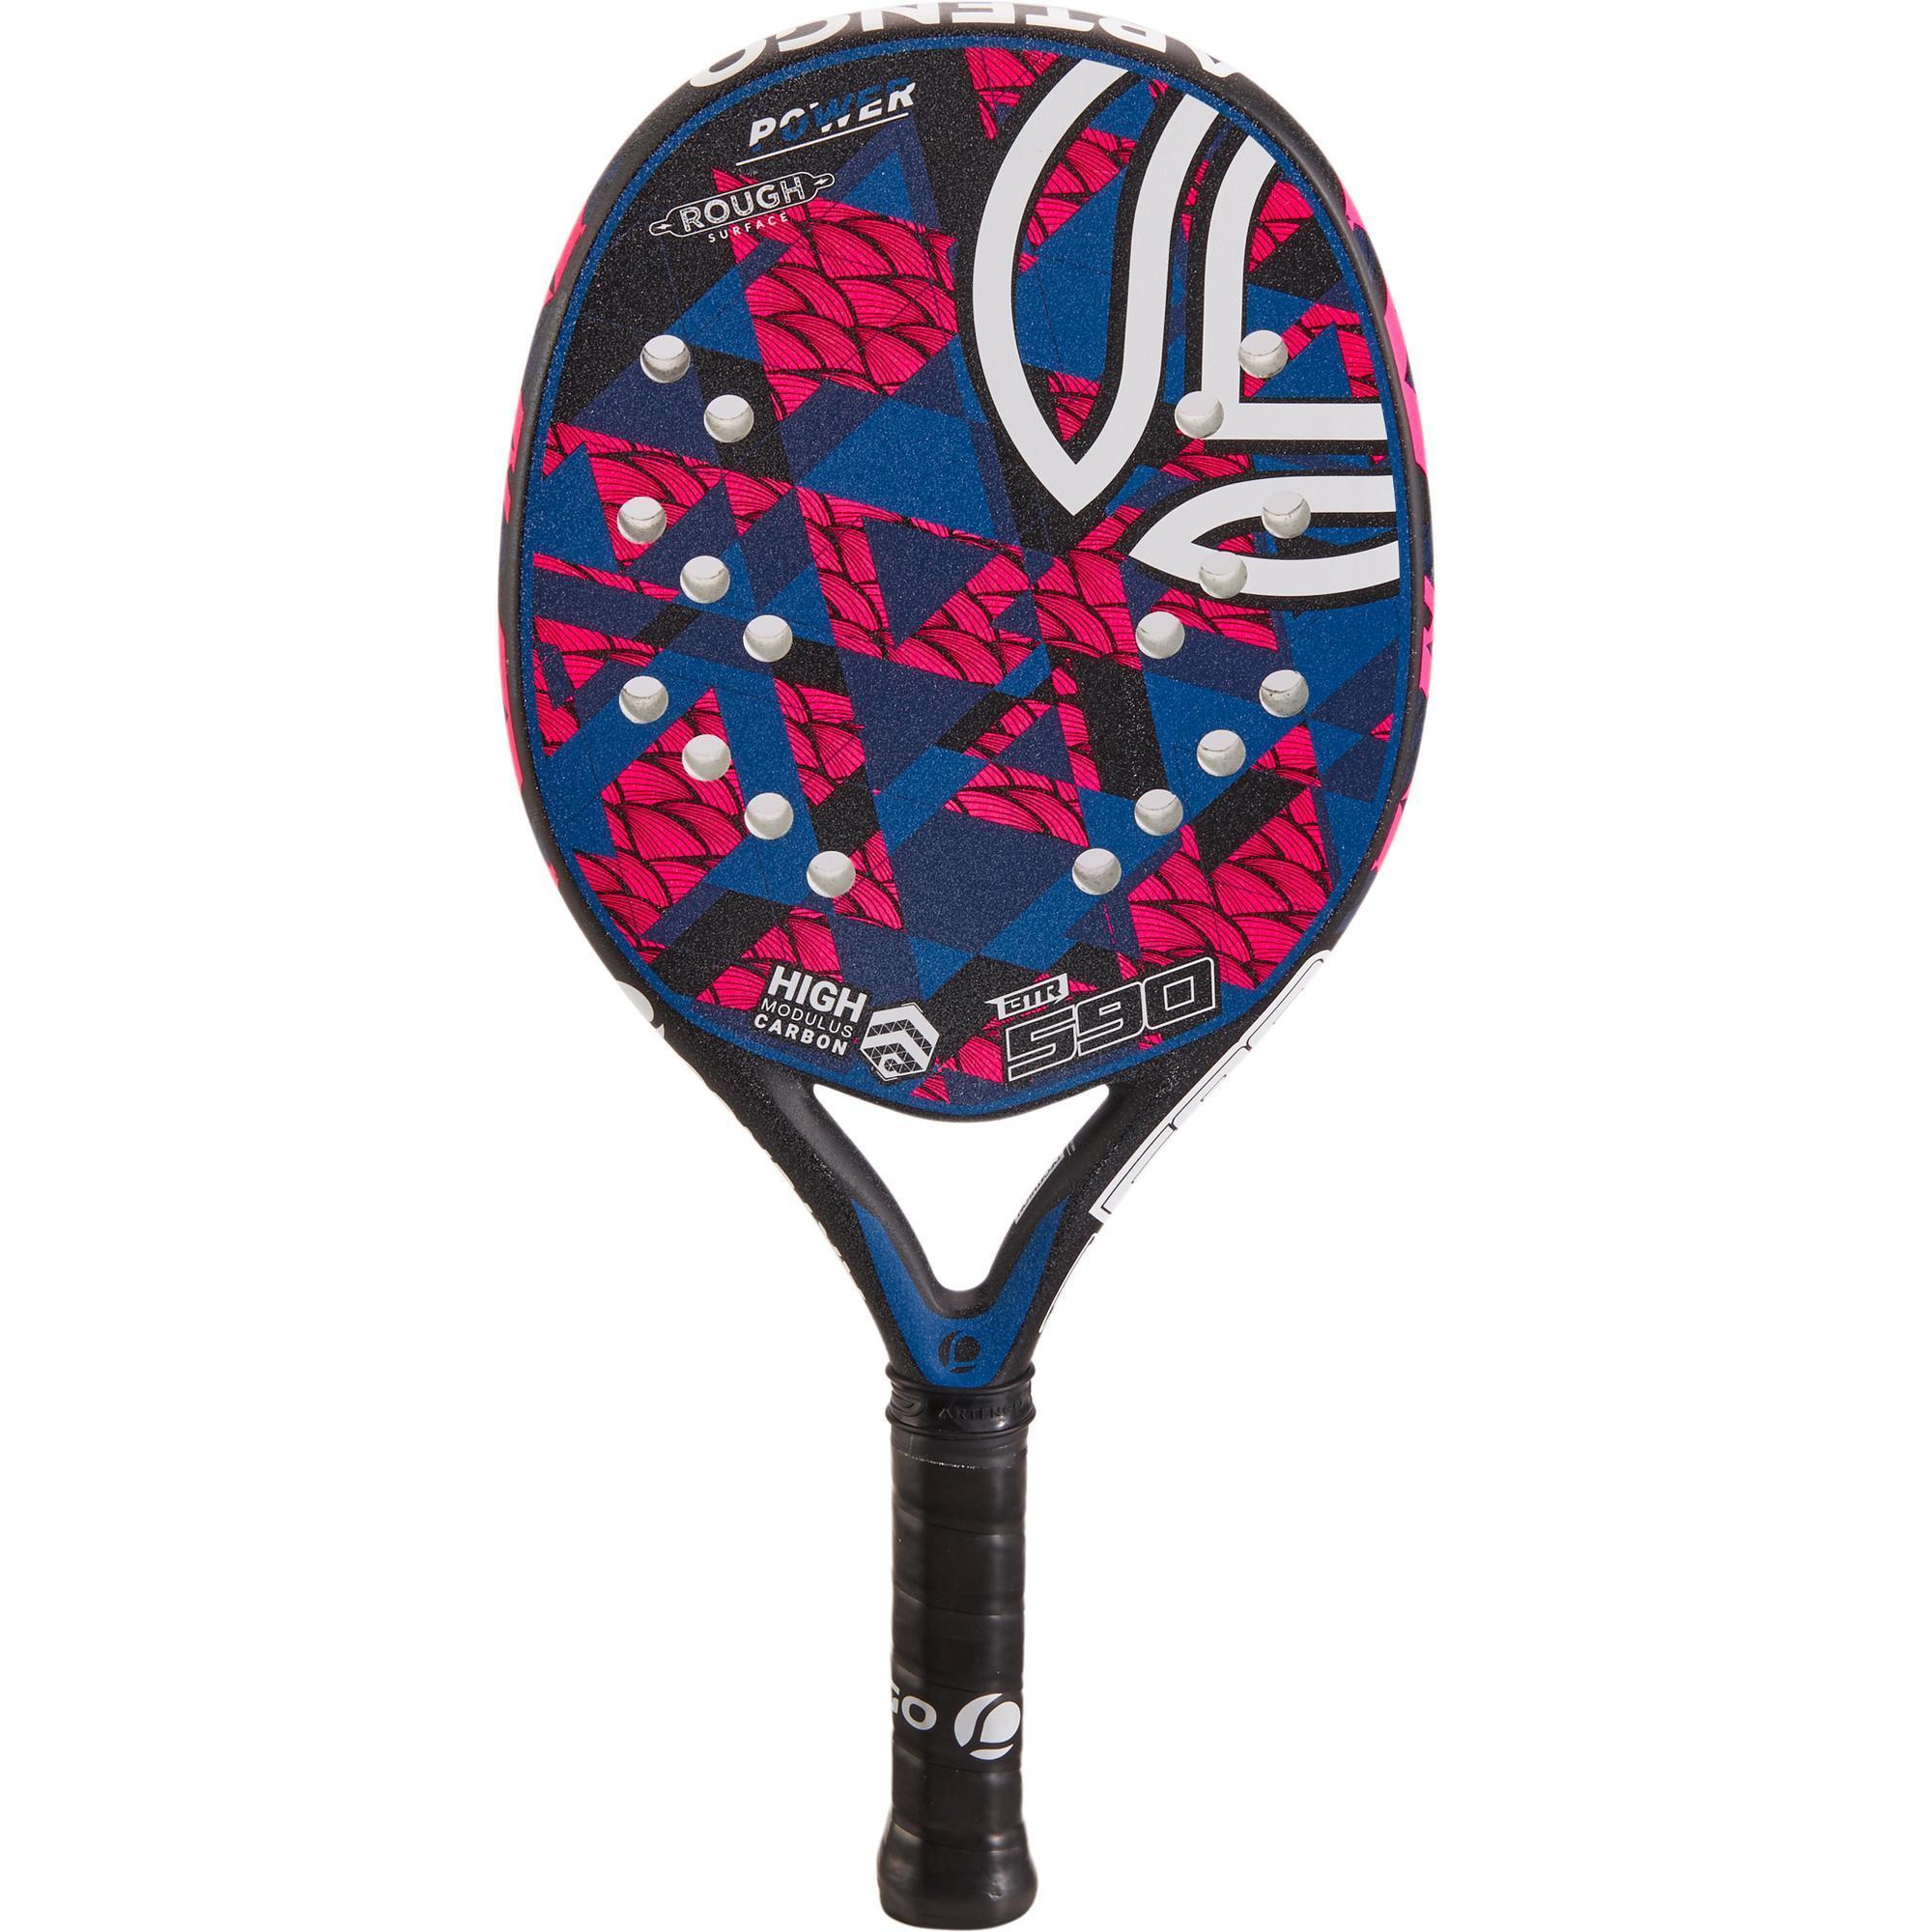 cd07da8f5f42e5 Artengo Beachtennis racket BTR 590 roze blauw